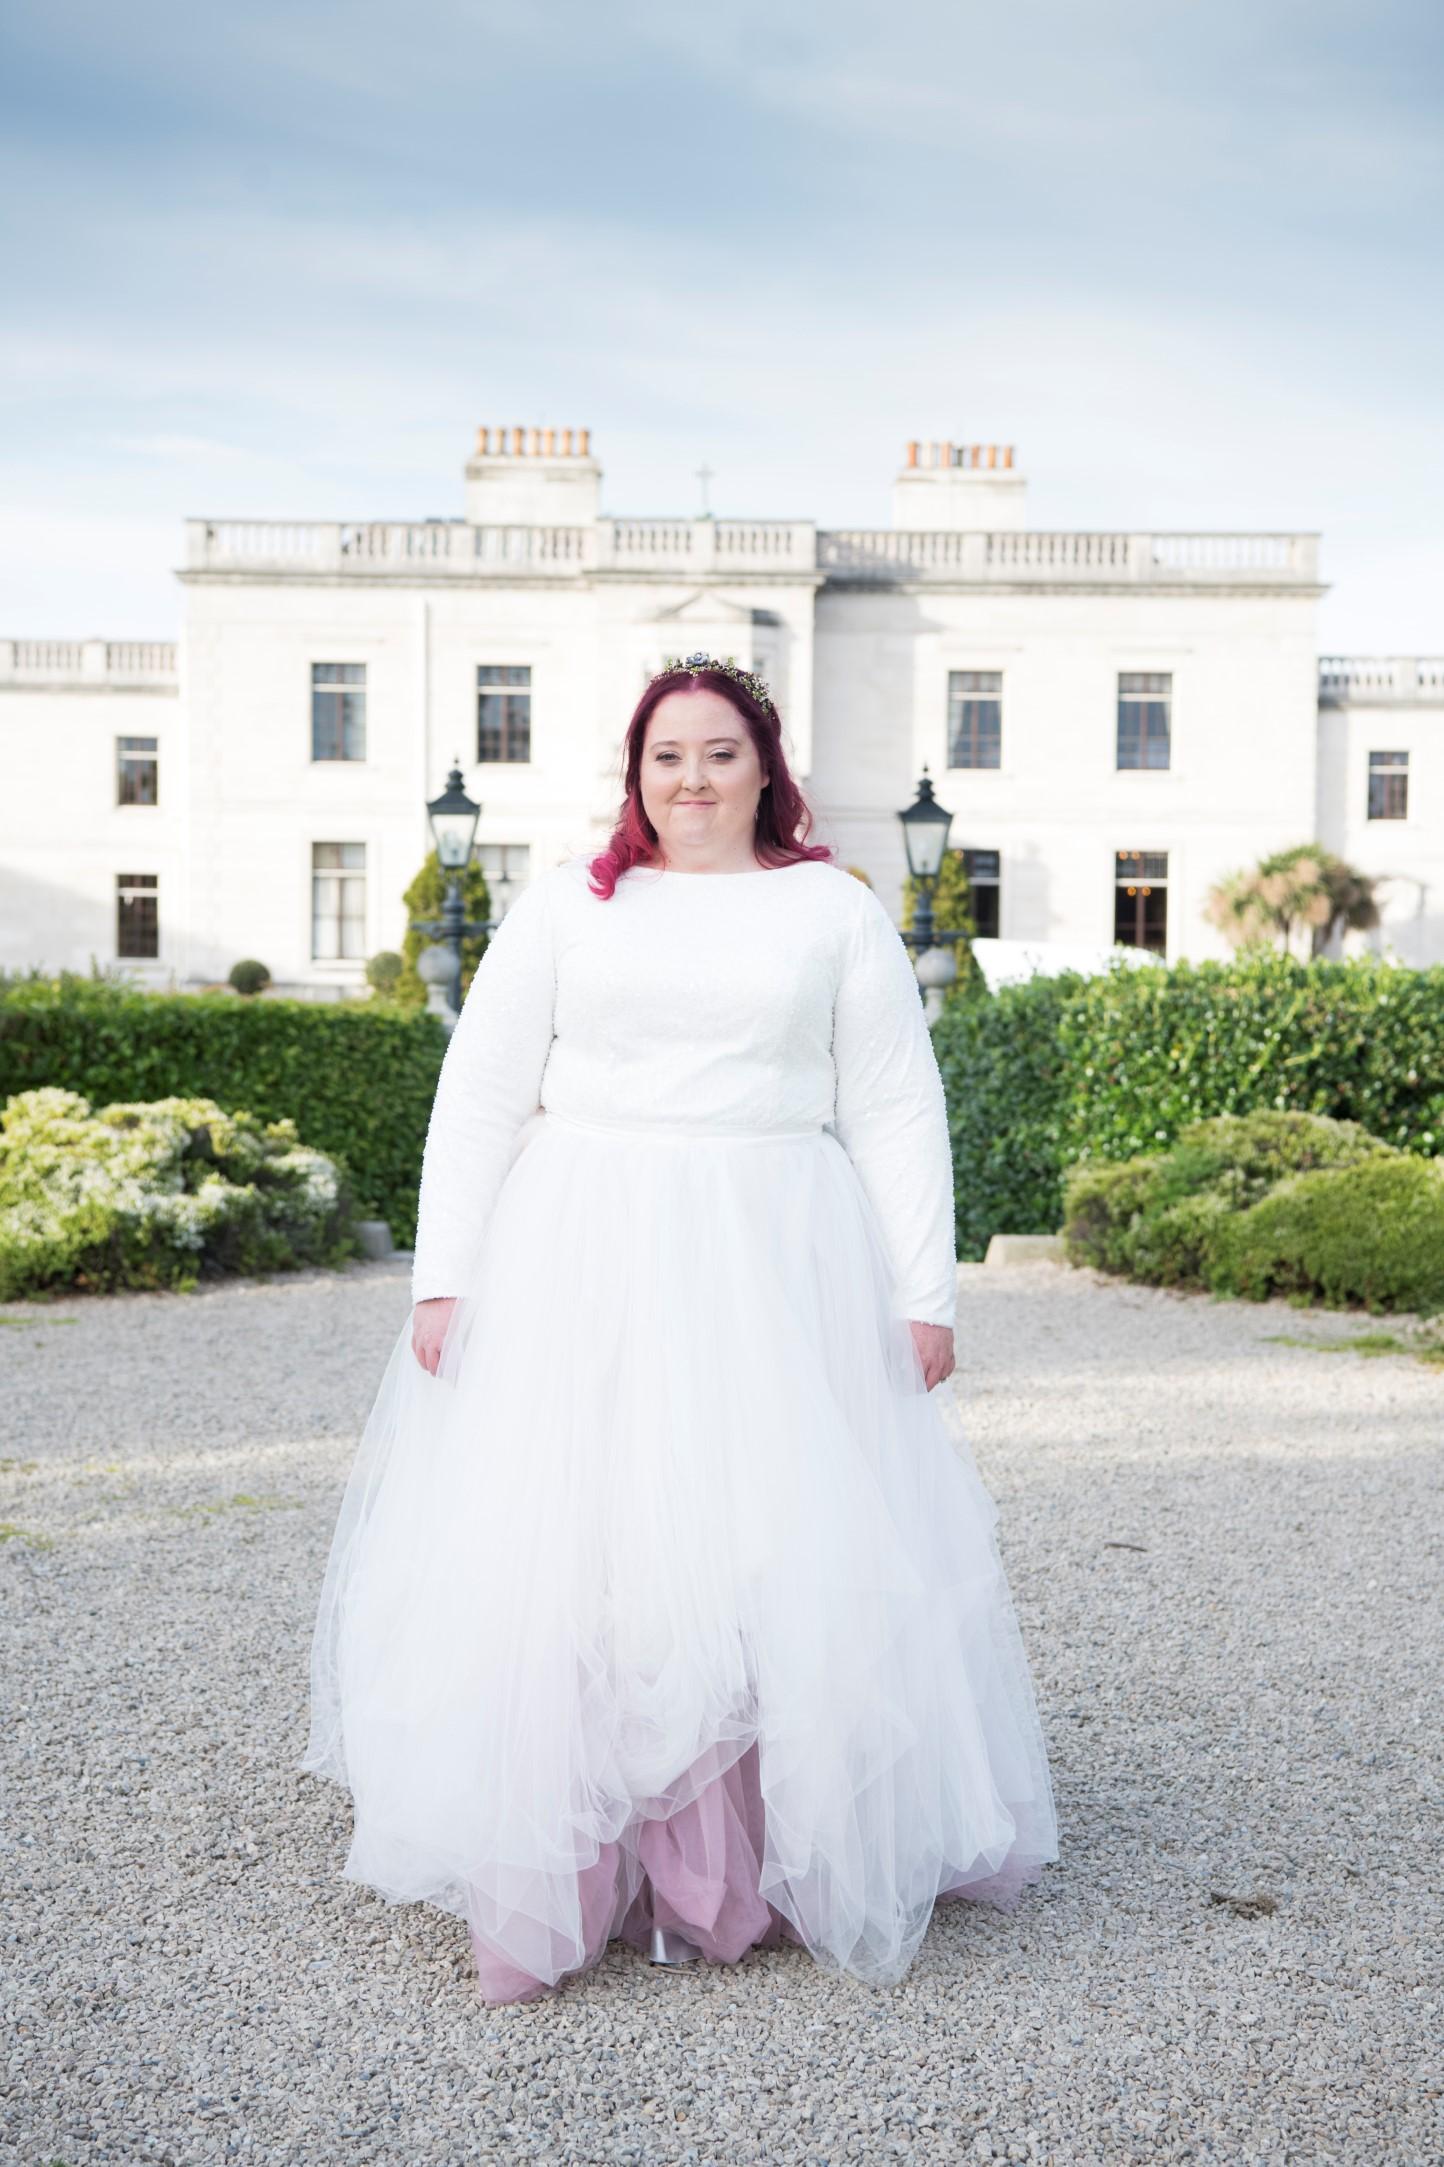 Zoo Wedding- Emma May Photography- Unconventional Wedding- Unique Wedding Inspiration- Alternative Bride